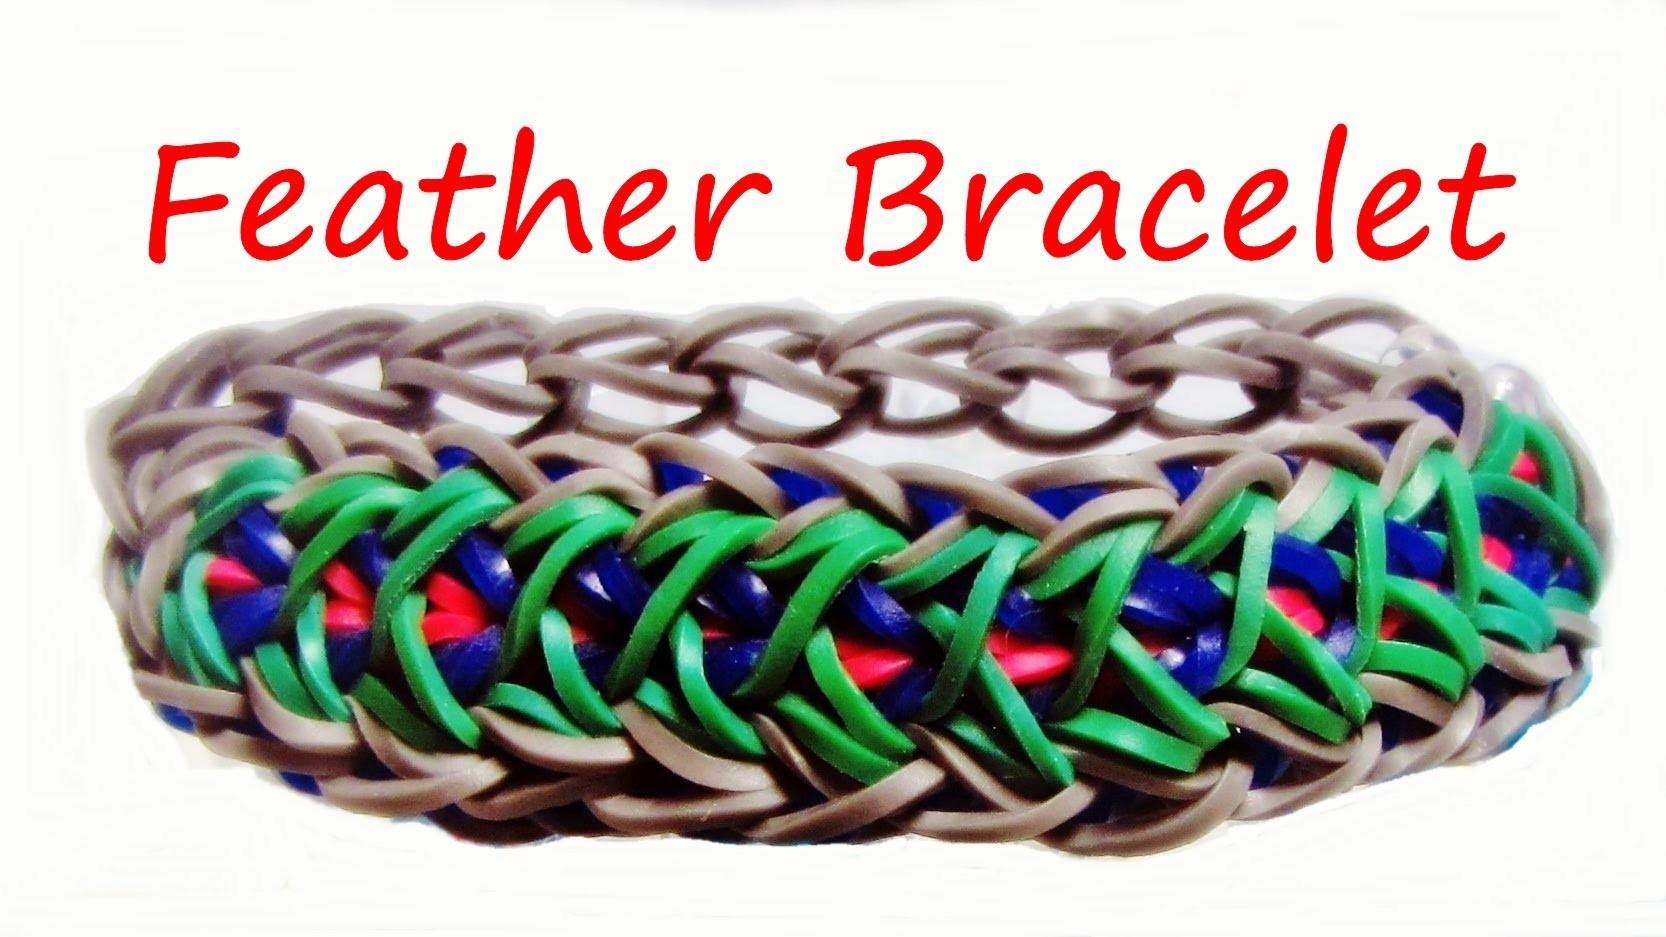 Loom Bands FEATHER BRACELET: How to Make it Tutorial. Design (Gumičky návod)